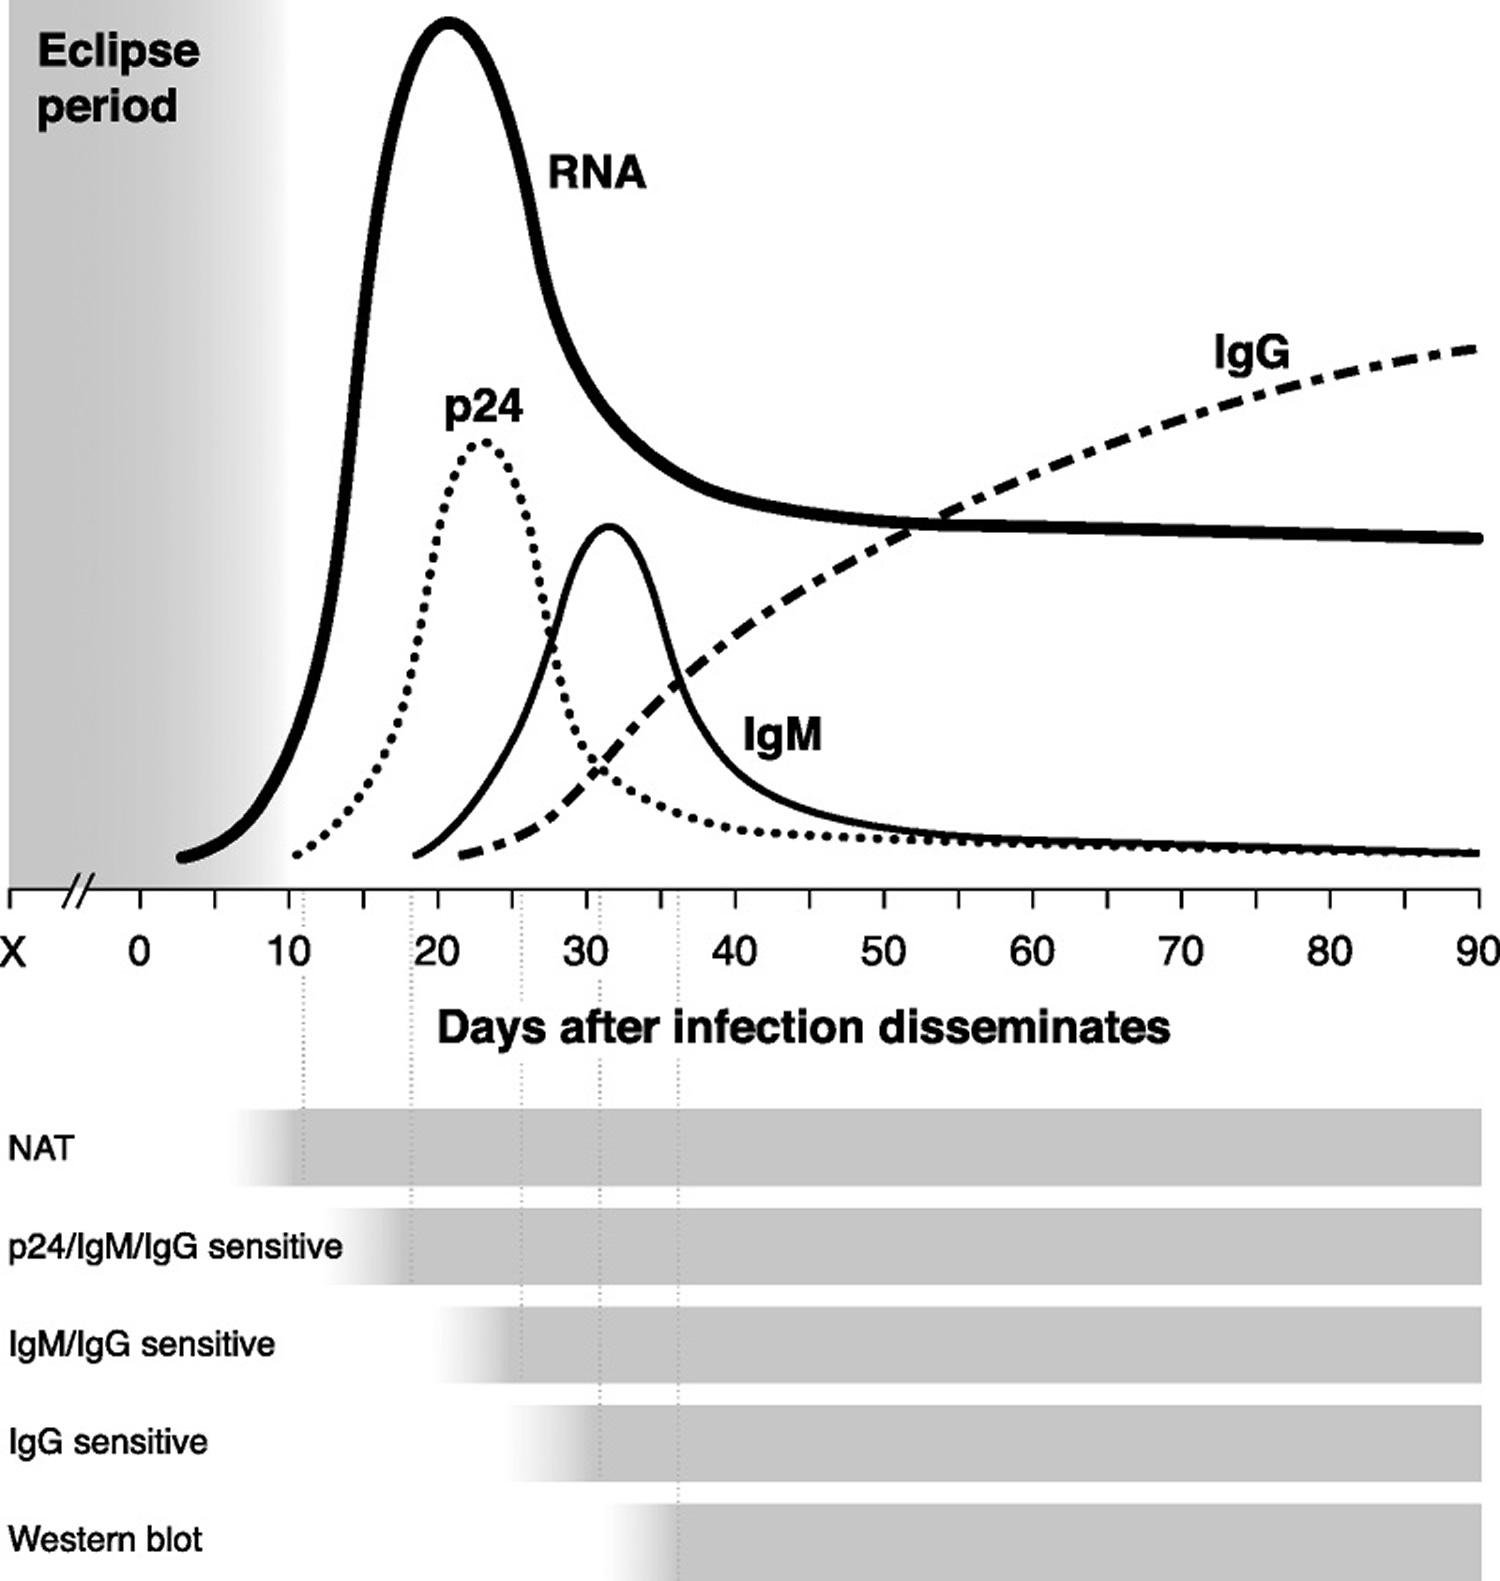 Timeline of virologic and serologic events after HIV infection